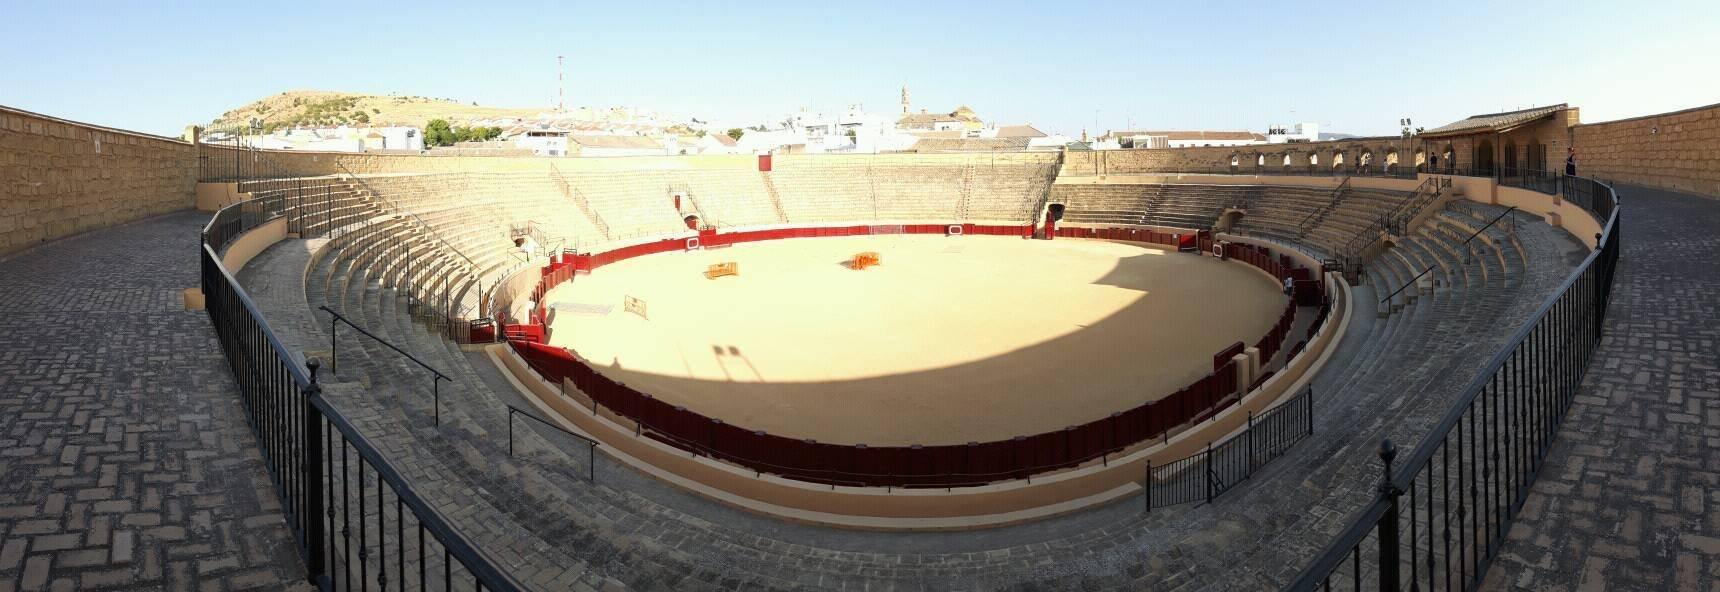 bullfighting-ring-osuna-1